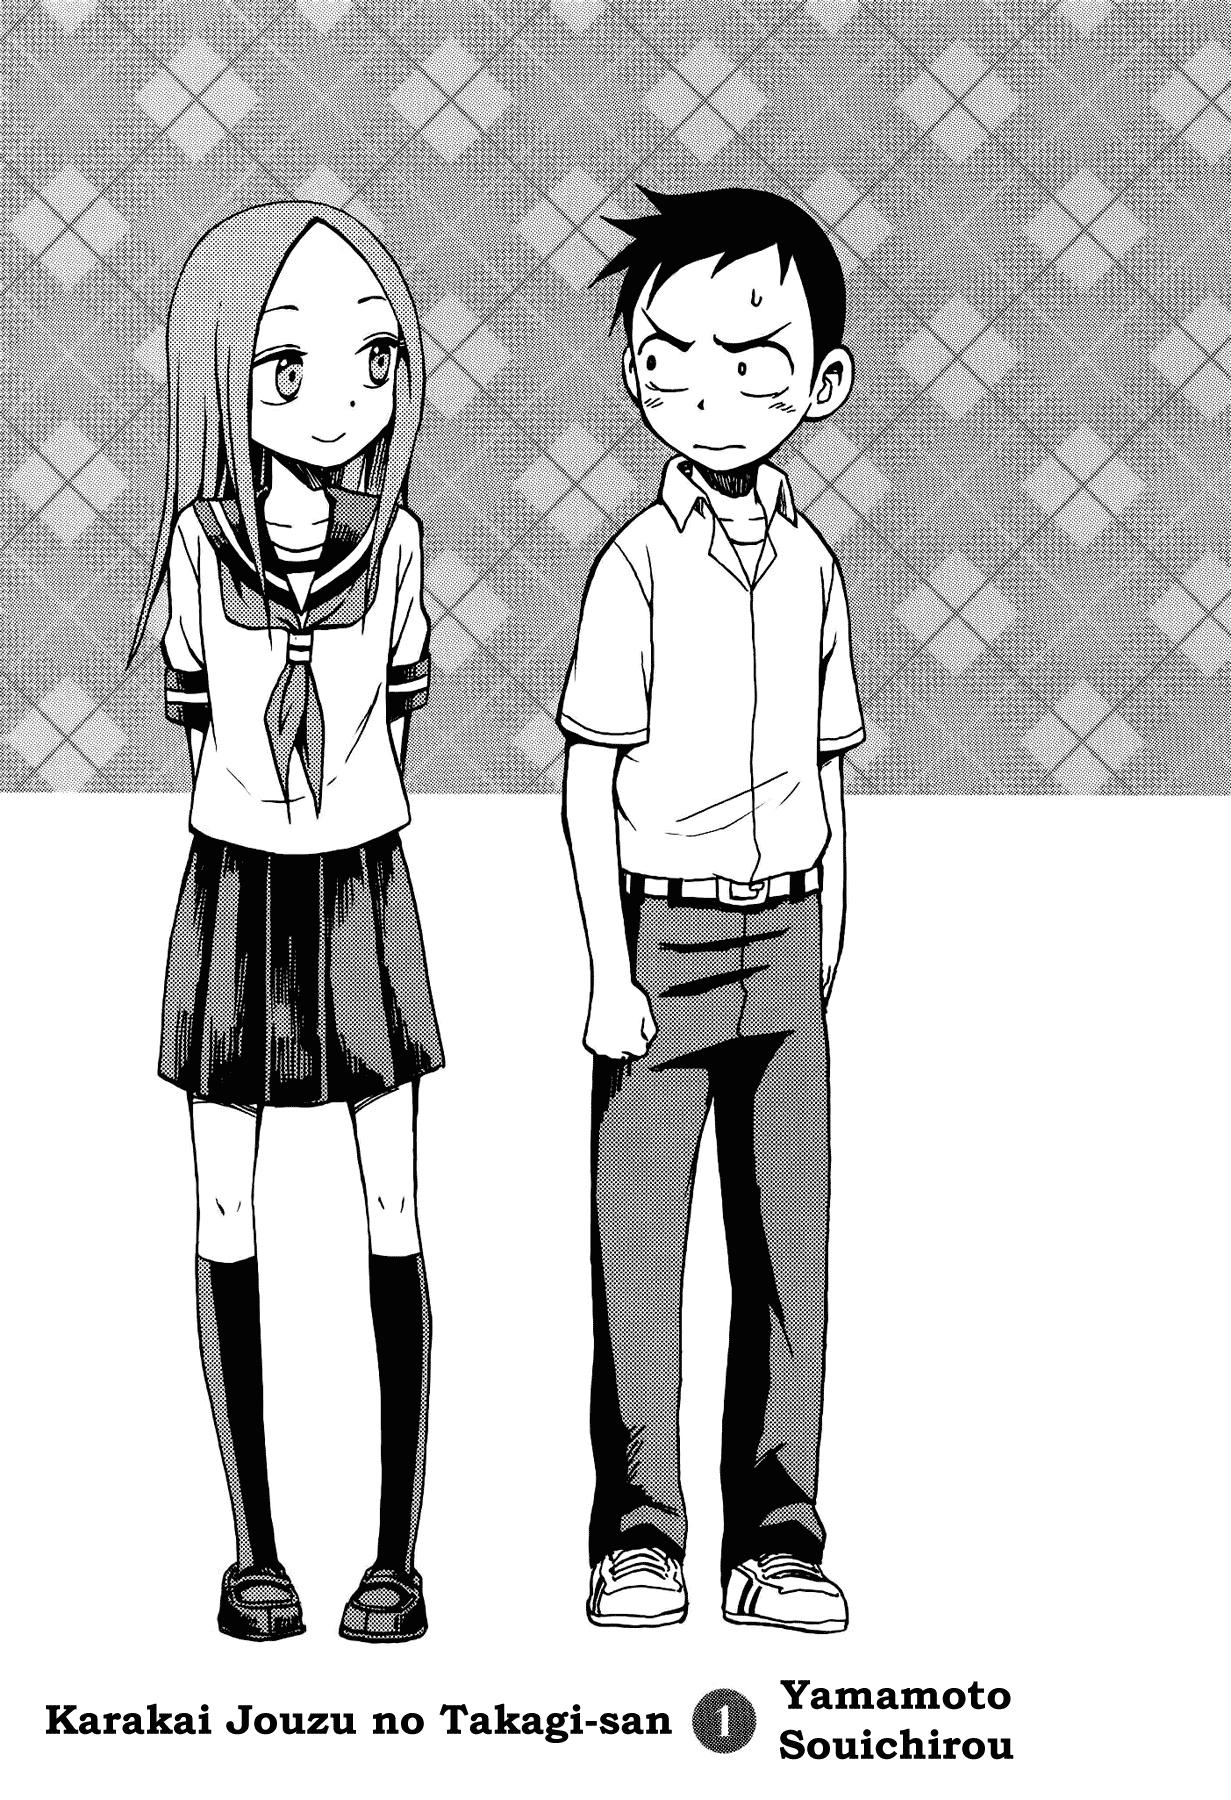 Karakai Jouzu no Takagi-san - Chapter 1